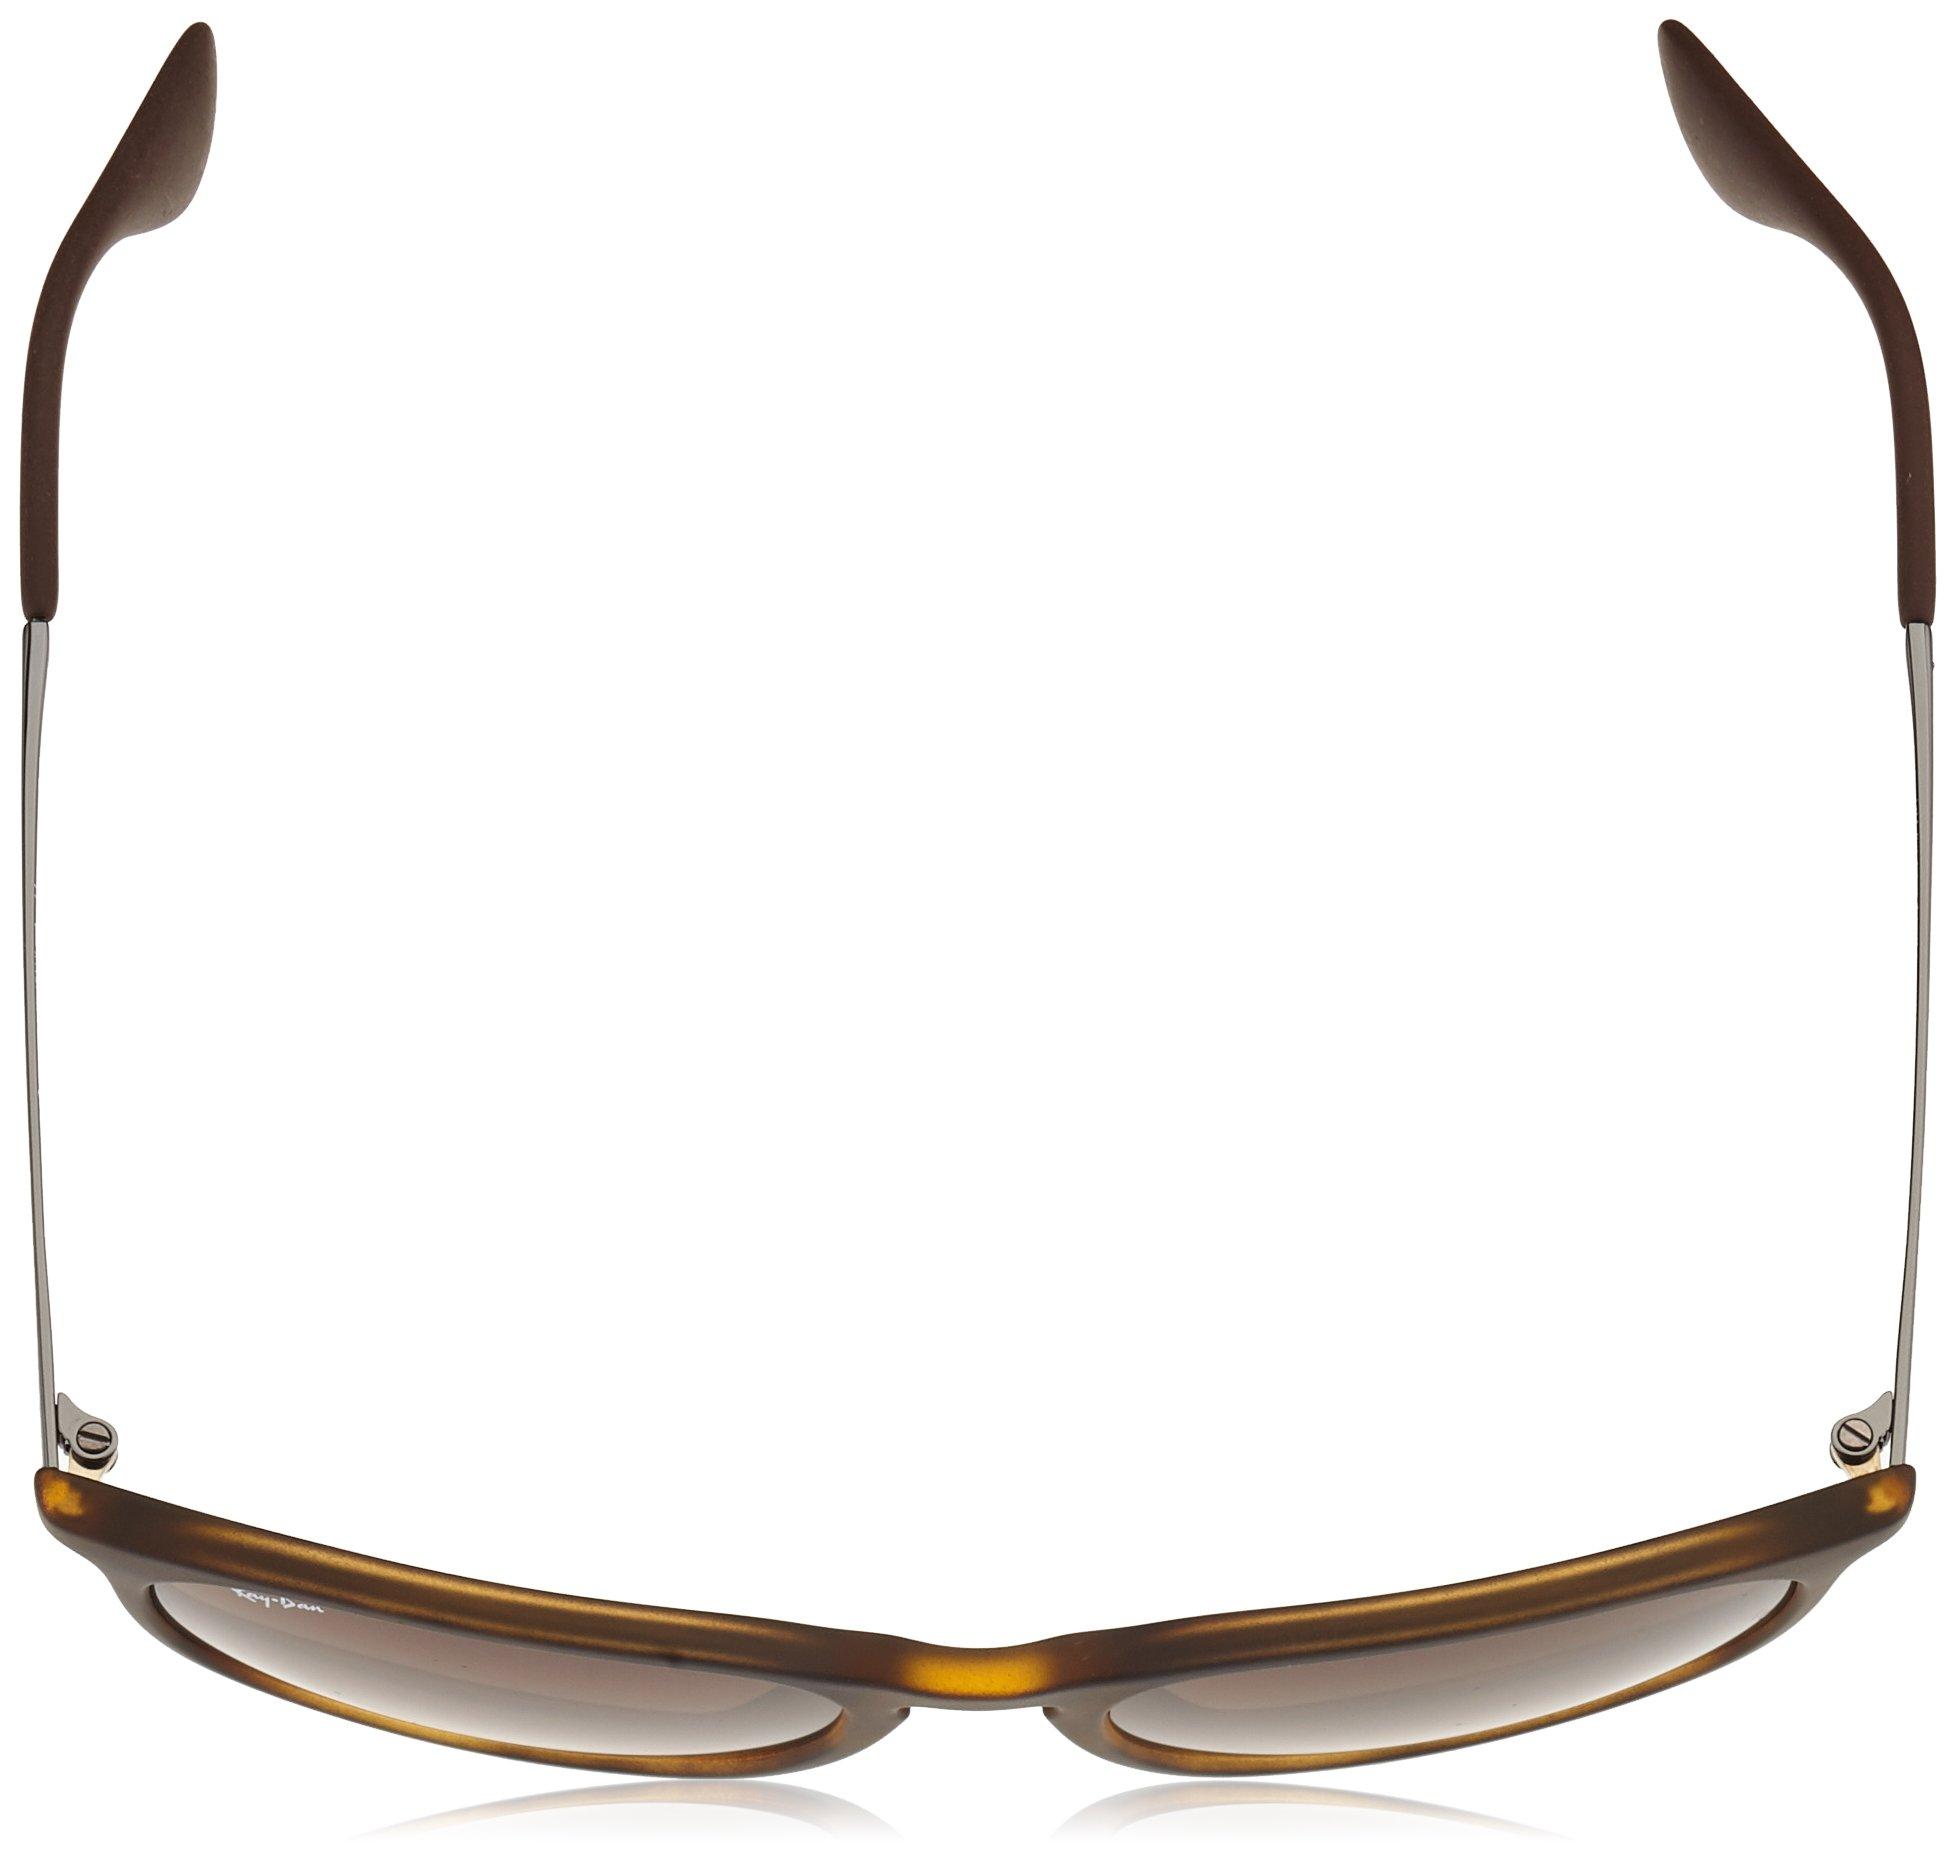 4aedc12083e3 Ray-Ban, RB4171, Erika Women's Oversized Round Sunglasses 54 mm, Havana  Rubber